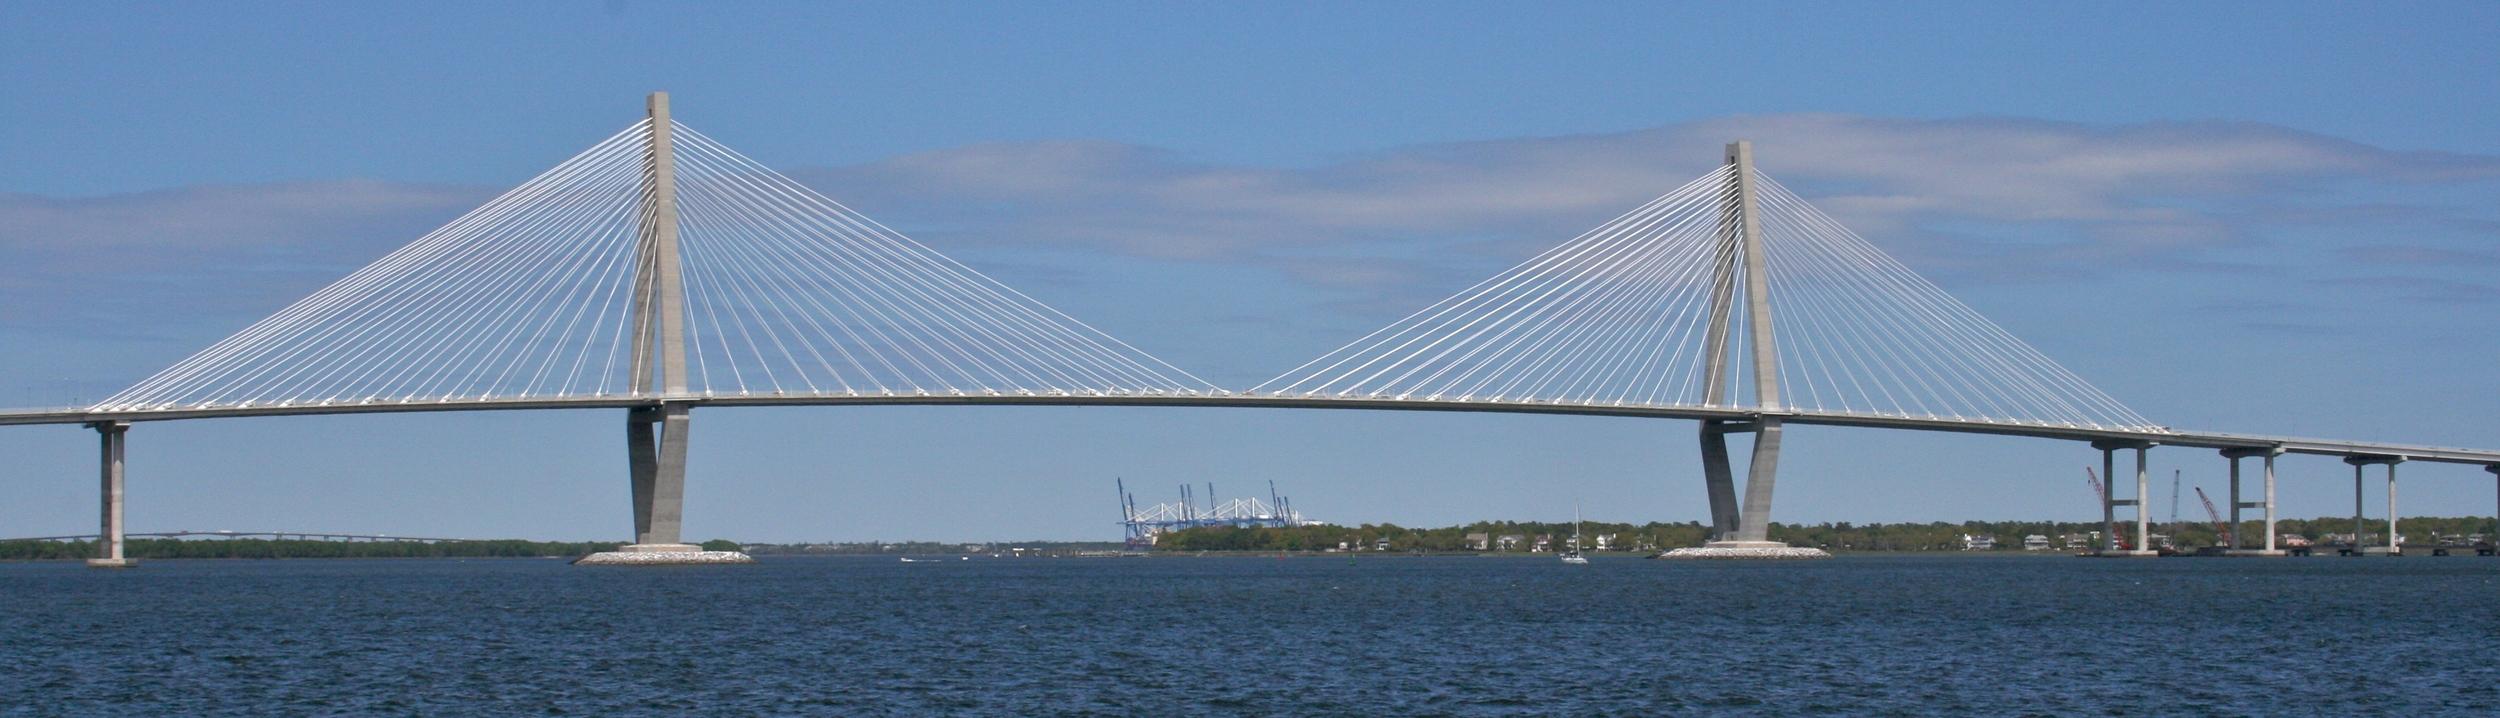 Arthur_Ravenel_Bridge_(from_water).jpg